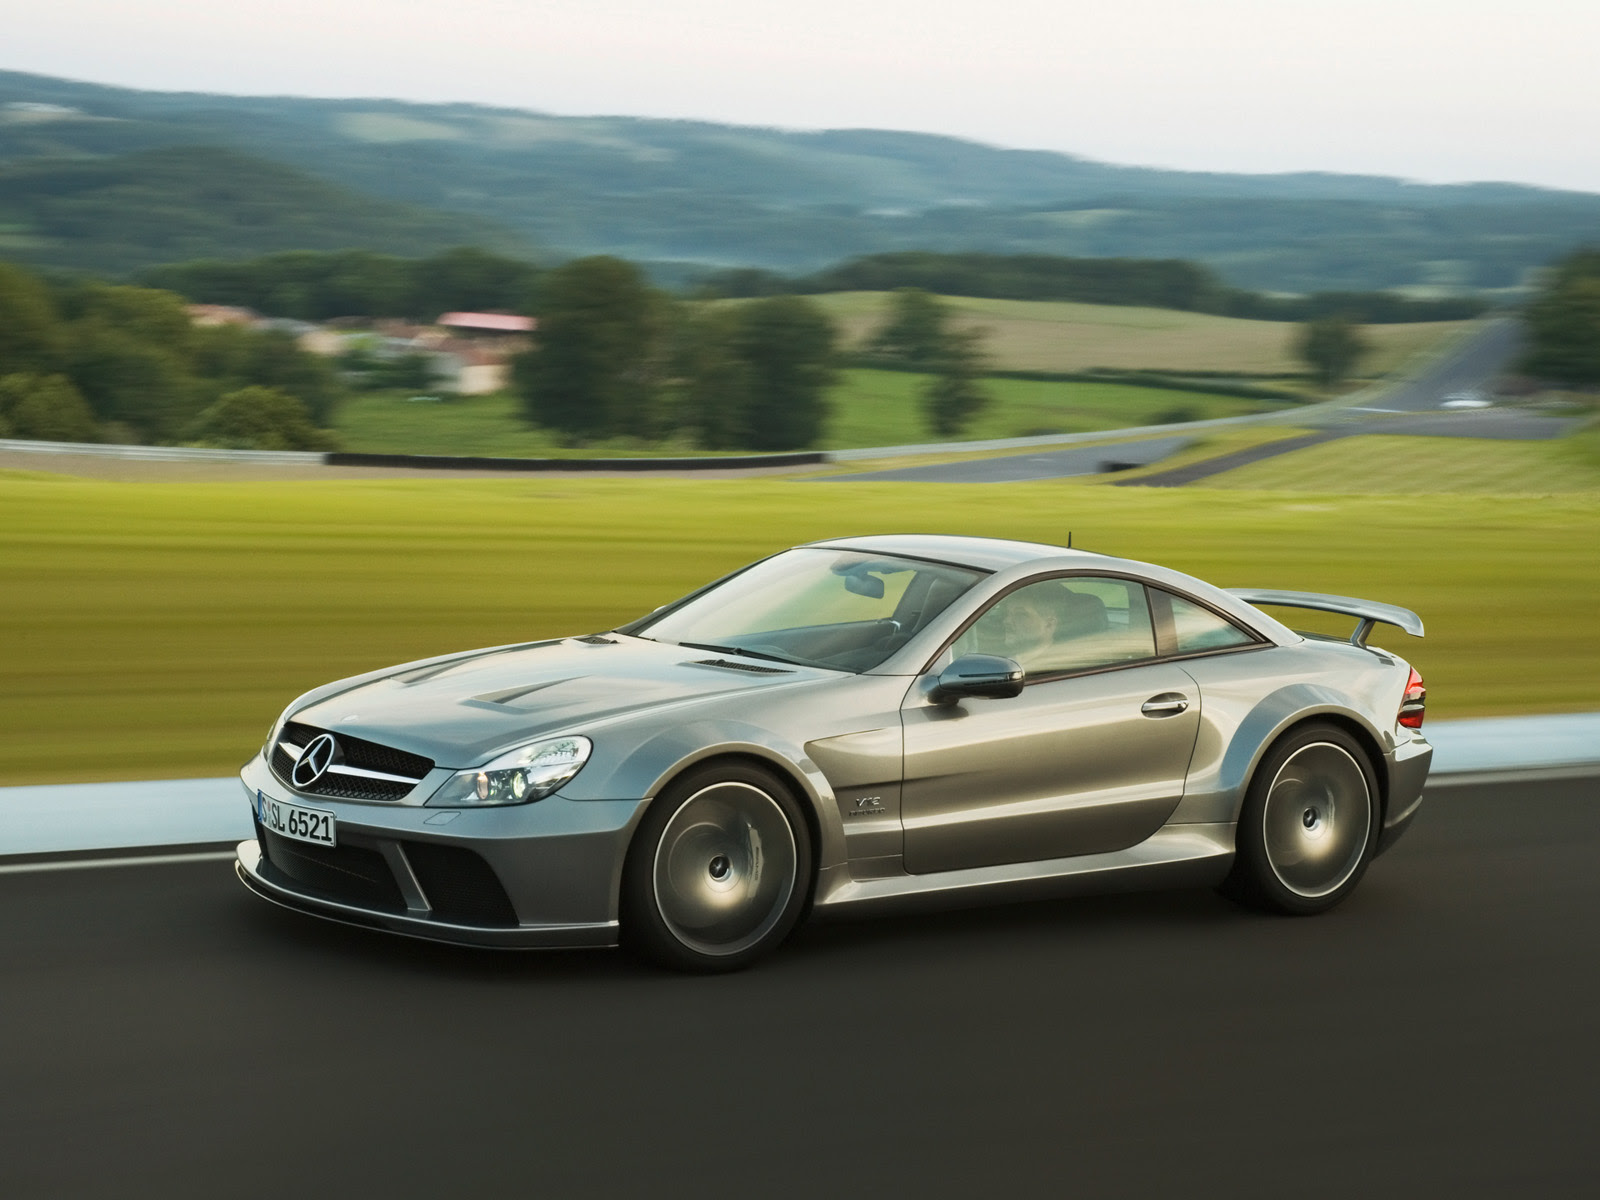 Fastest Cars: Mercedes Benz SL65 AMG Nice Cars